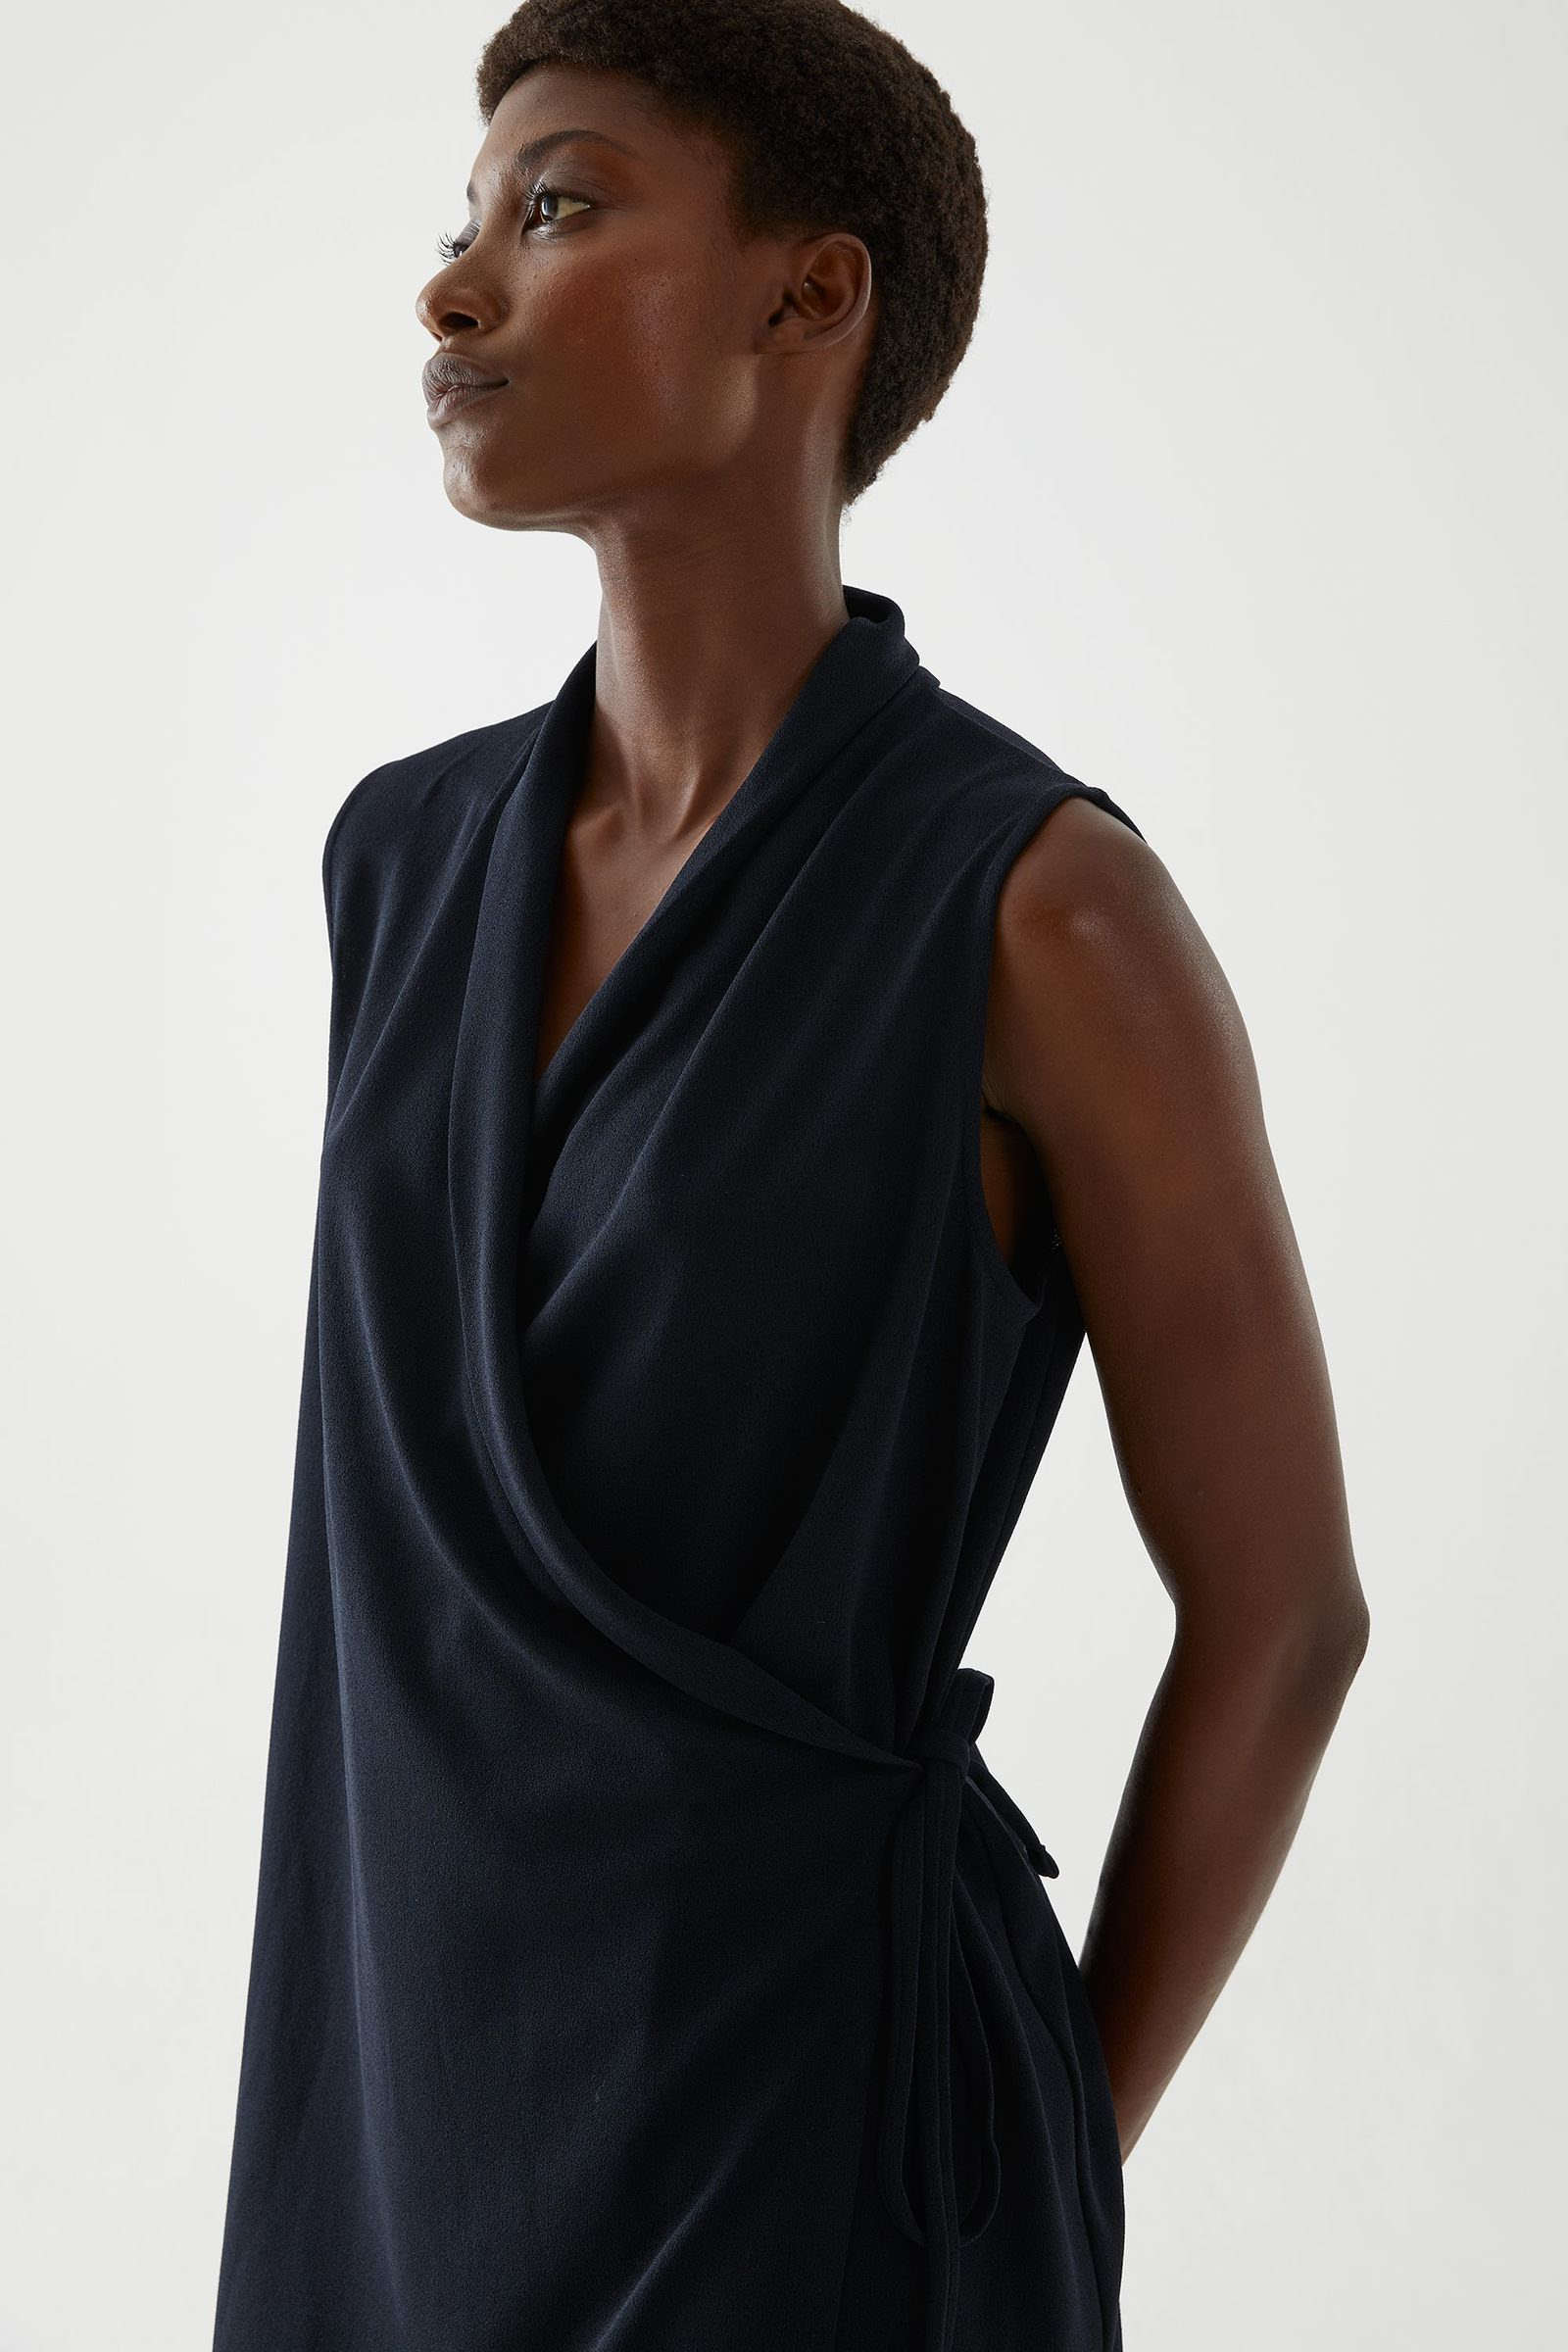 COS 슬리브리스 카울 넥 드레스의 블랙컬러 ECOMLook입니다.